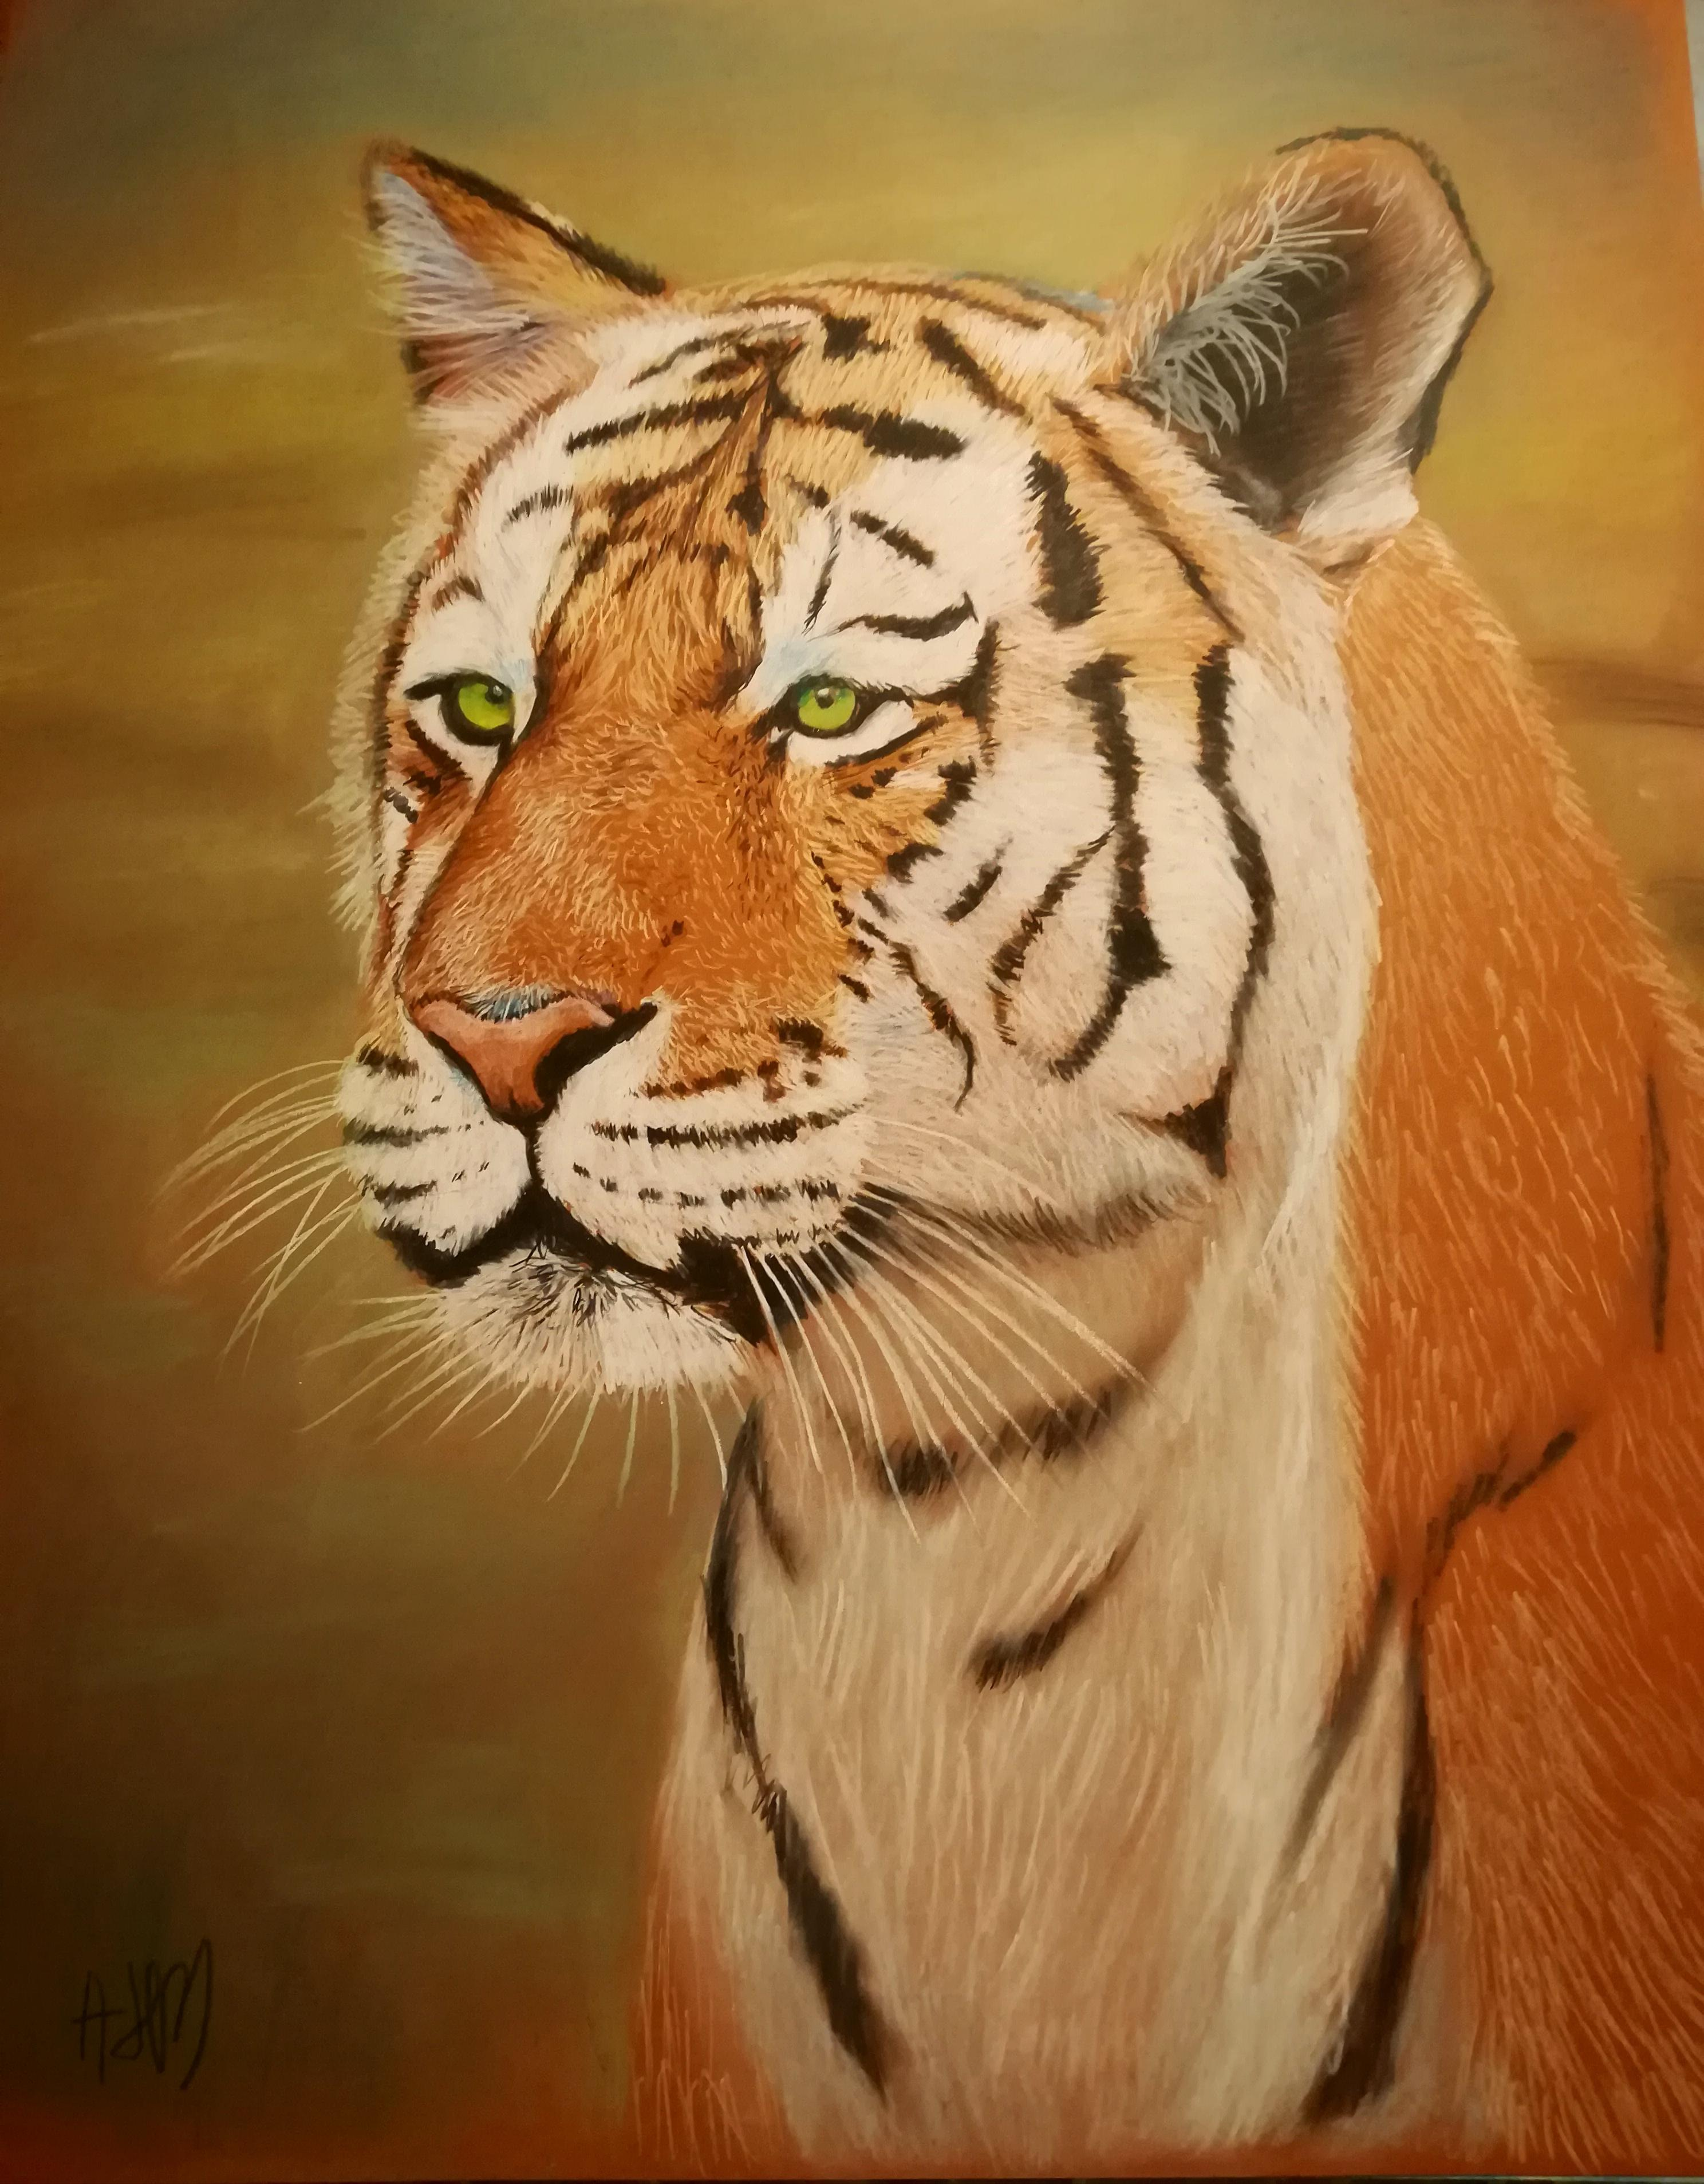 Color Tiger Face Drawing : color, tiger, drawing, Tiger,, Pastels, Color, Pencils, Drawing